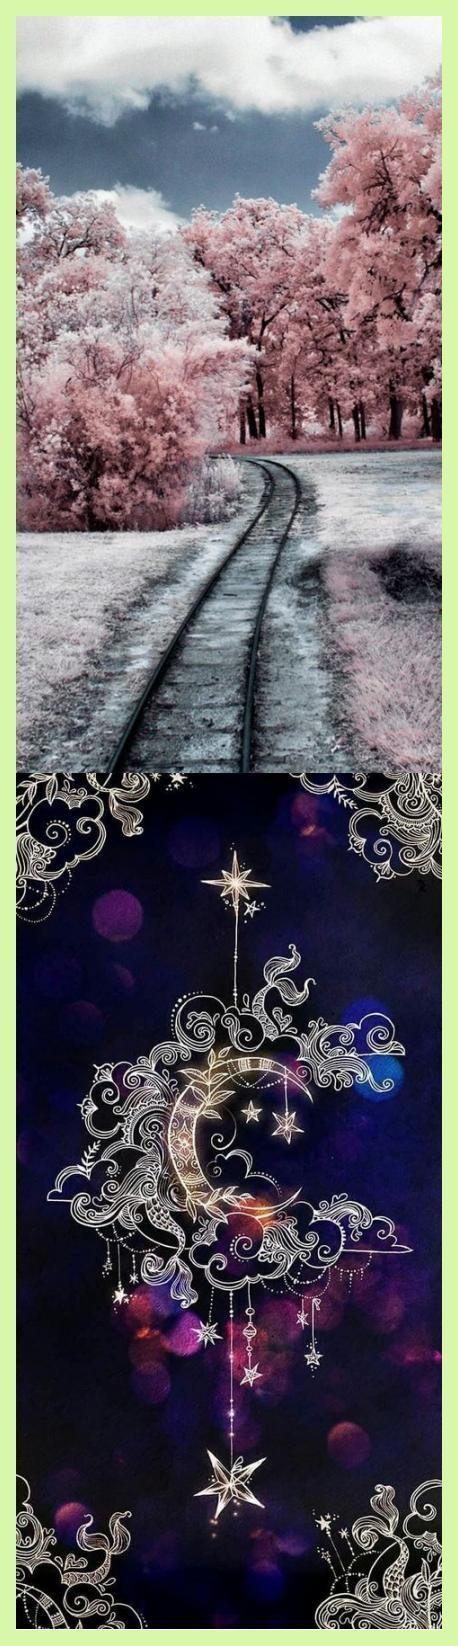 Tumblr Hintergrundbilder Iphone  Background  LiPiN  Silent Winter Wallpaper for IPhone  Versace